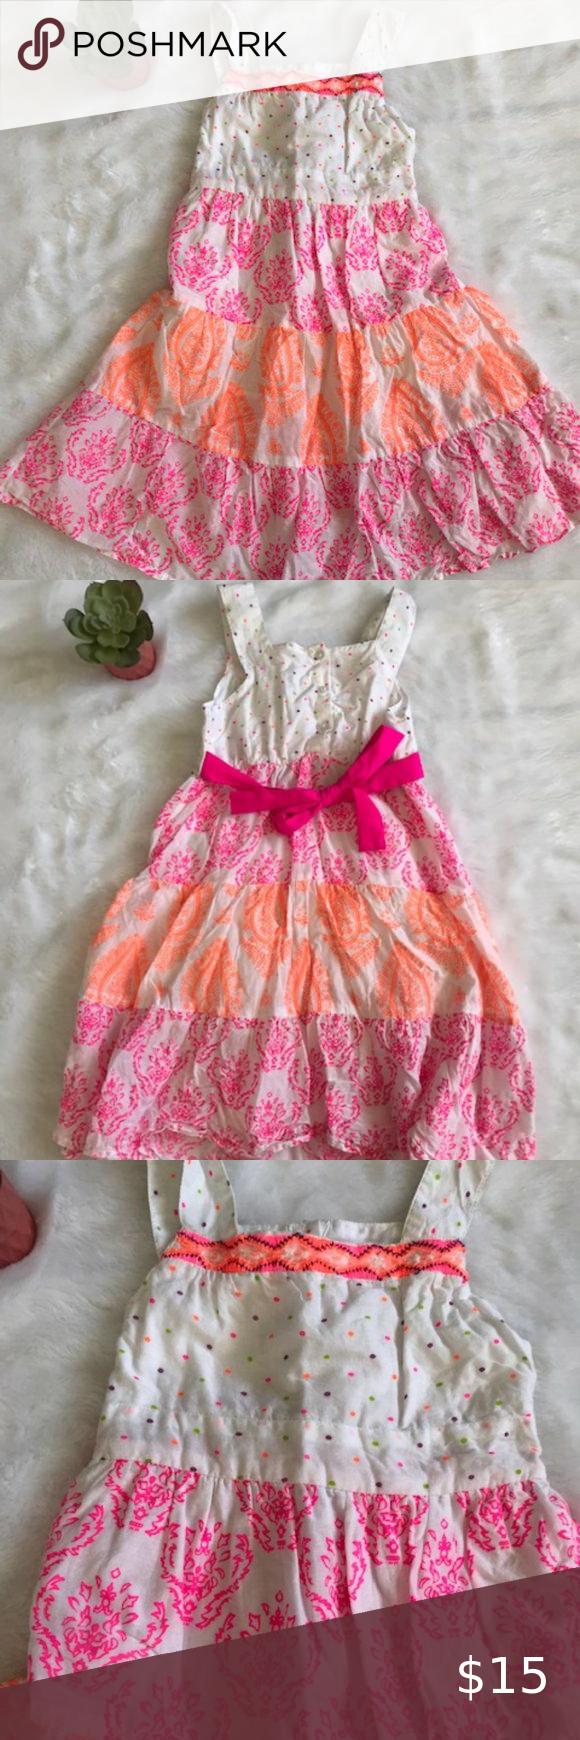 Japna Toddlers Paisley Polka Dot Summer Dress Polka Dot Summer Dresses Summer Dresses Dresses [ 1740 x 580 Pixel ]